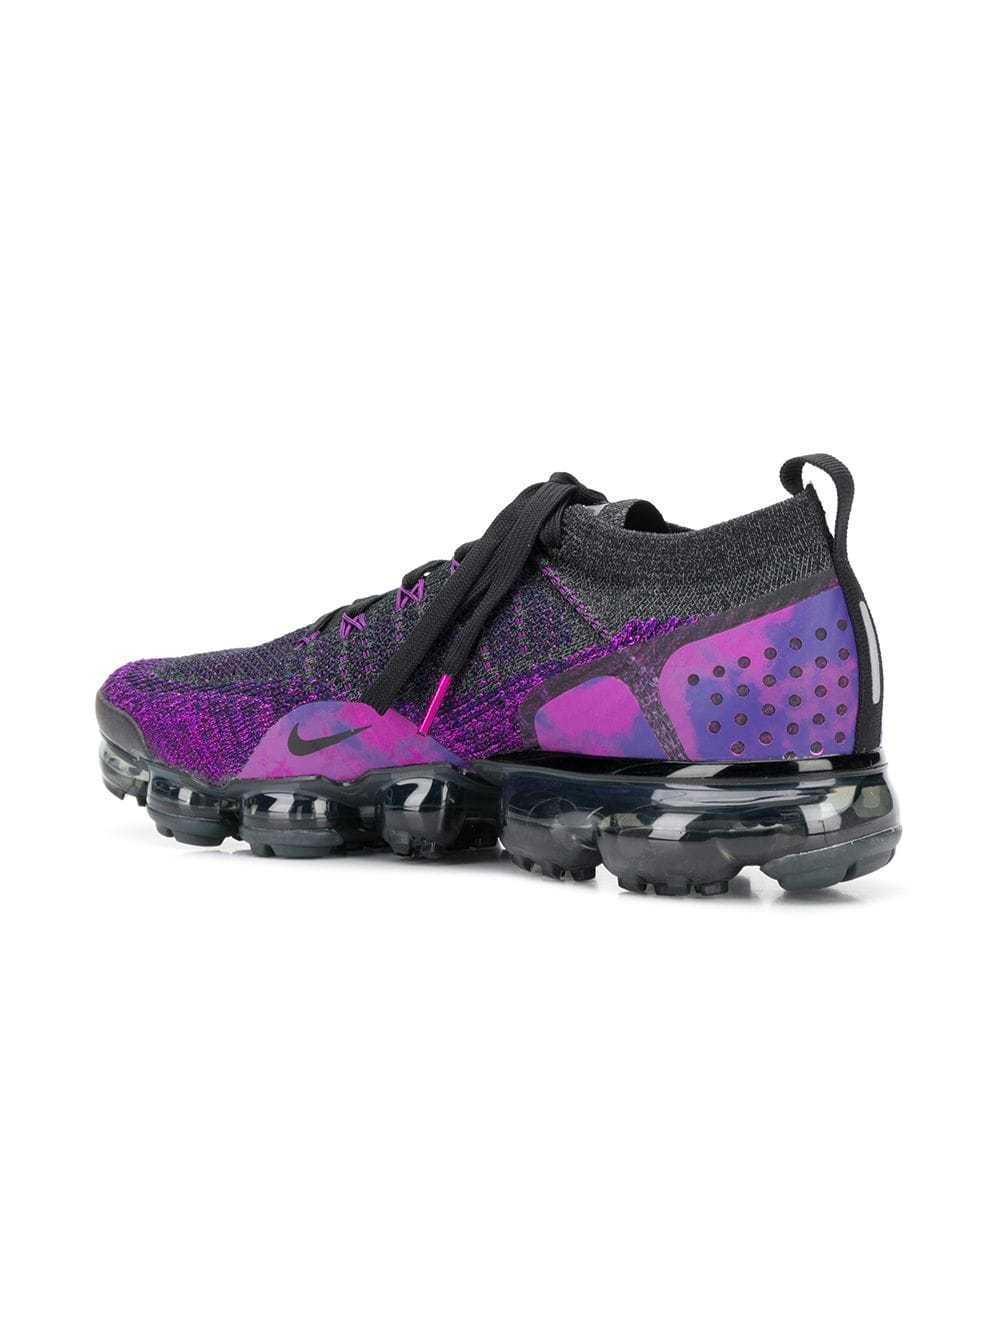 official photos 595aa 55773 Air Vapormax Flyknit 2 Sneakers